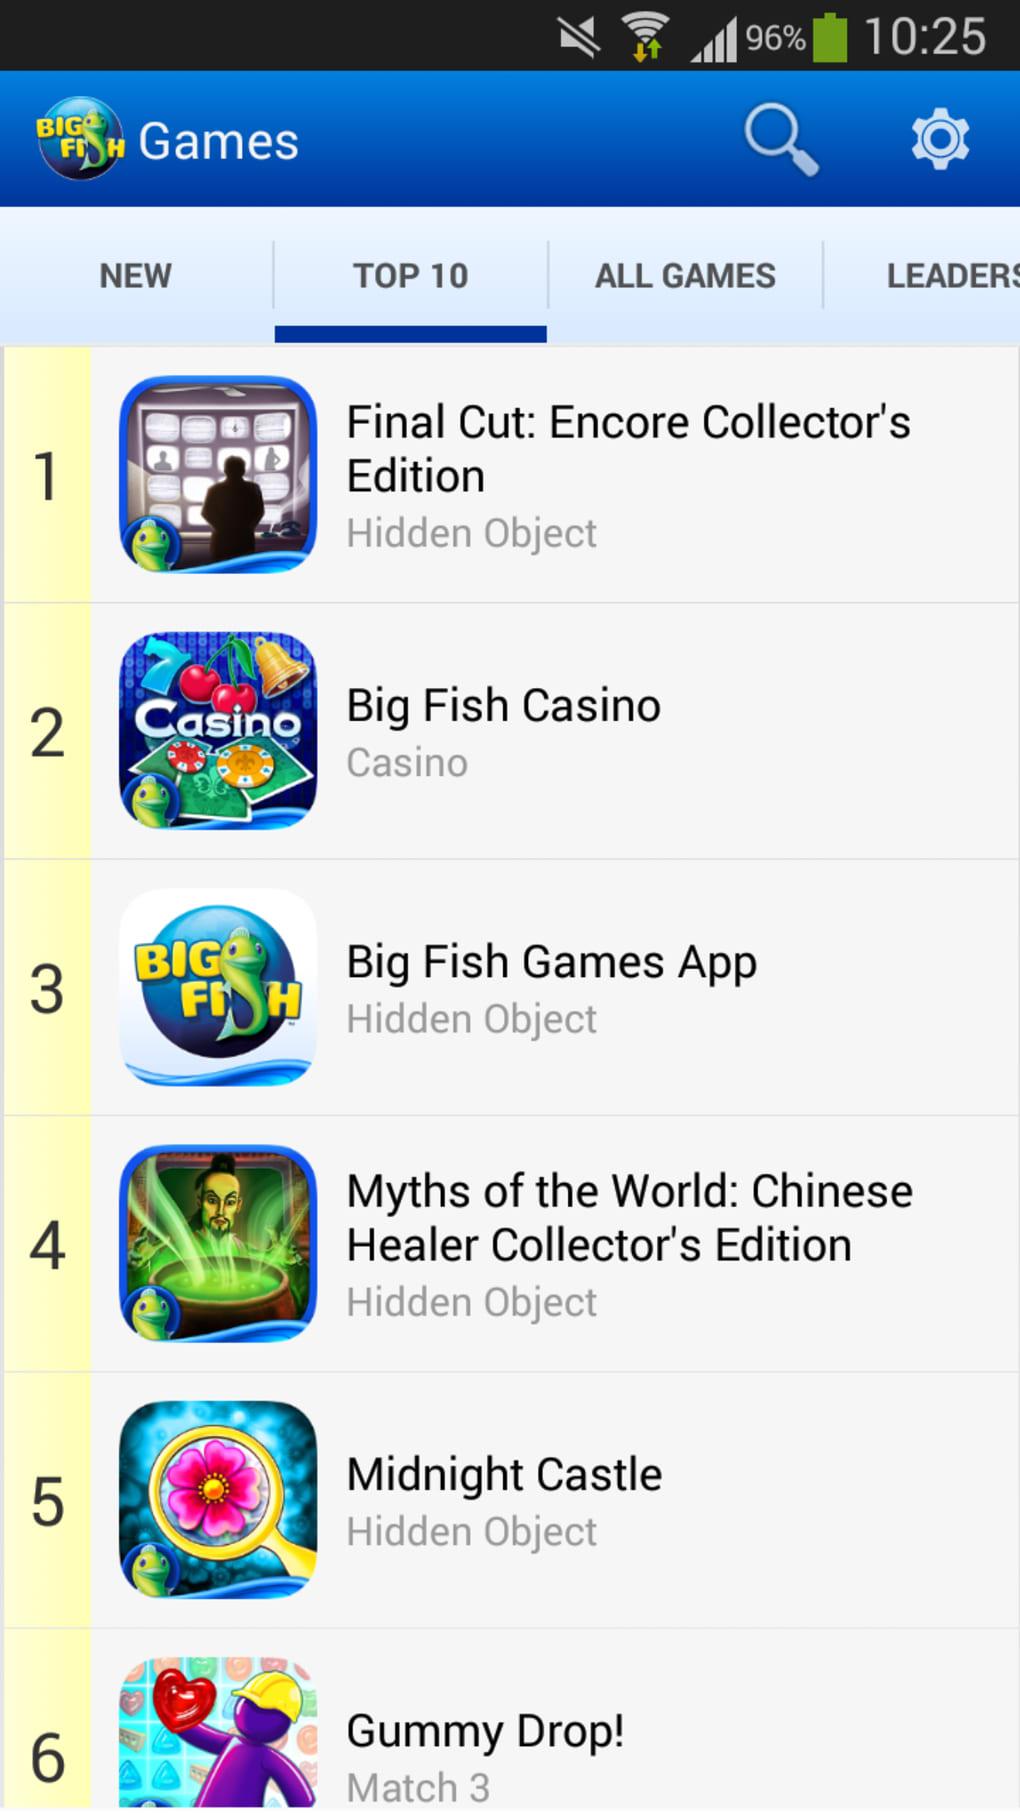 big fish games app pour android t l charger. Black Bedroom Furniture Sets. Home Design Ideas